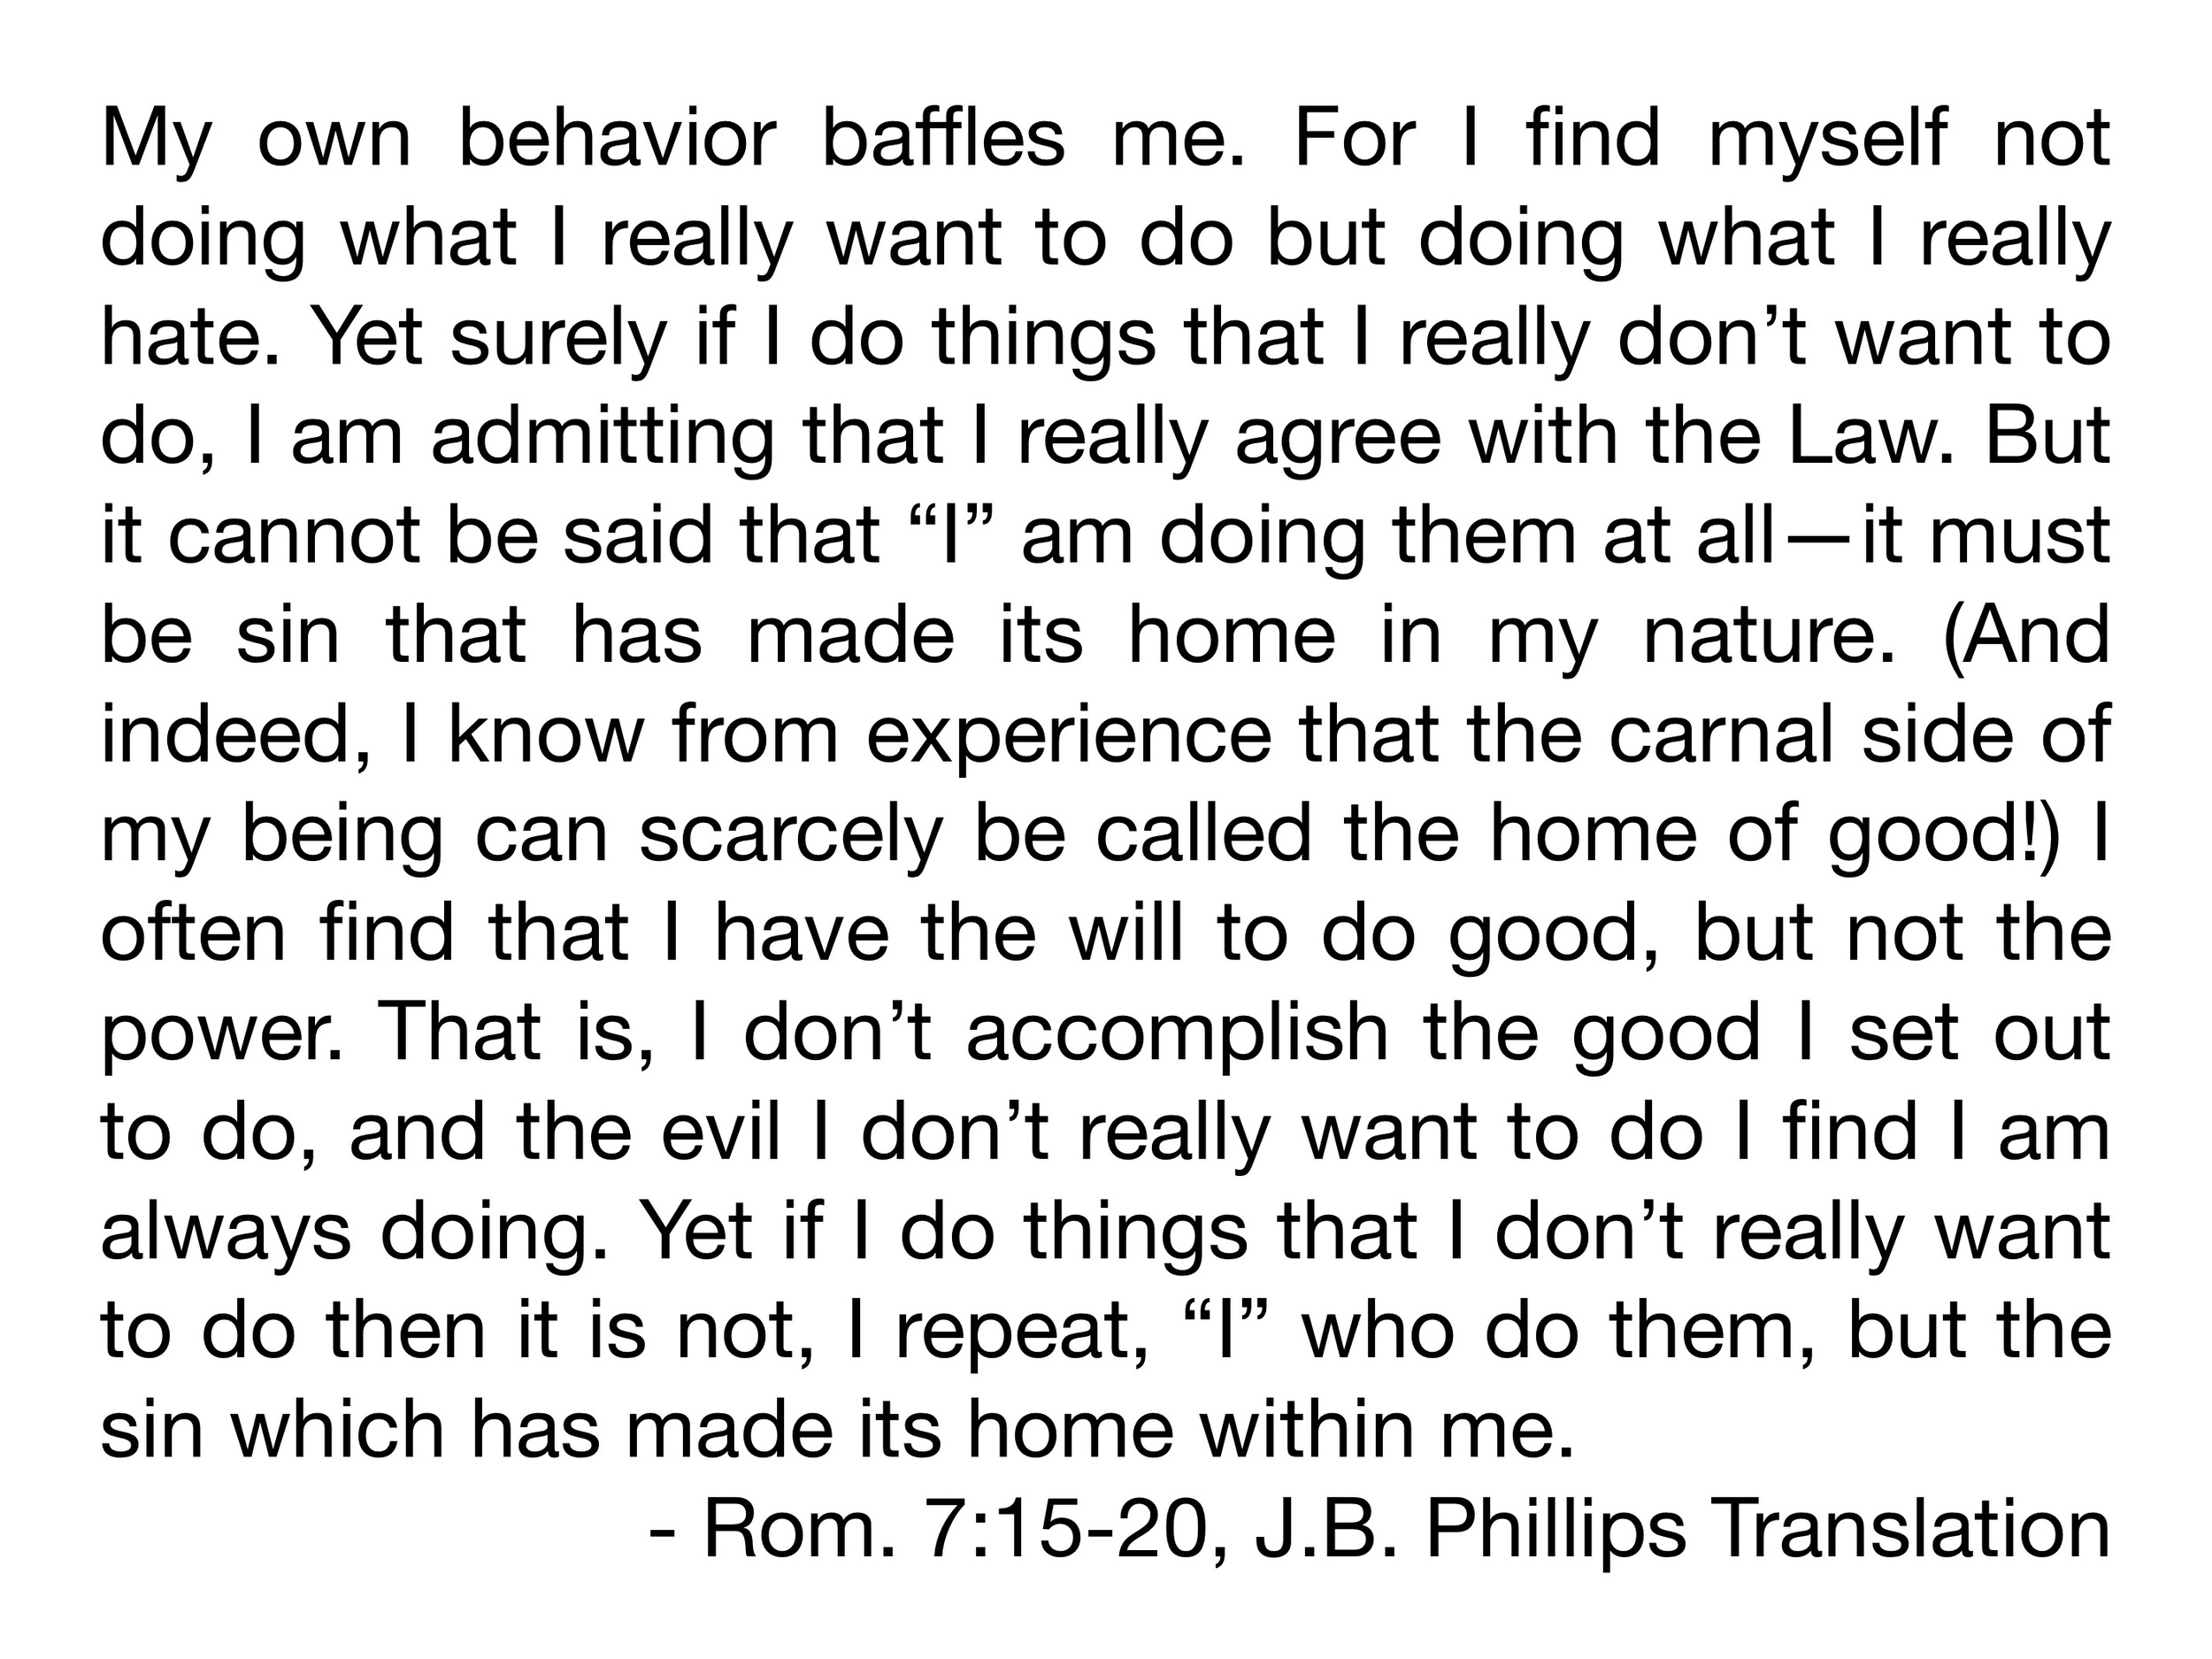 Romans 7:15-25 Sildes-1 19-19.jpeg